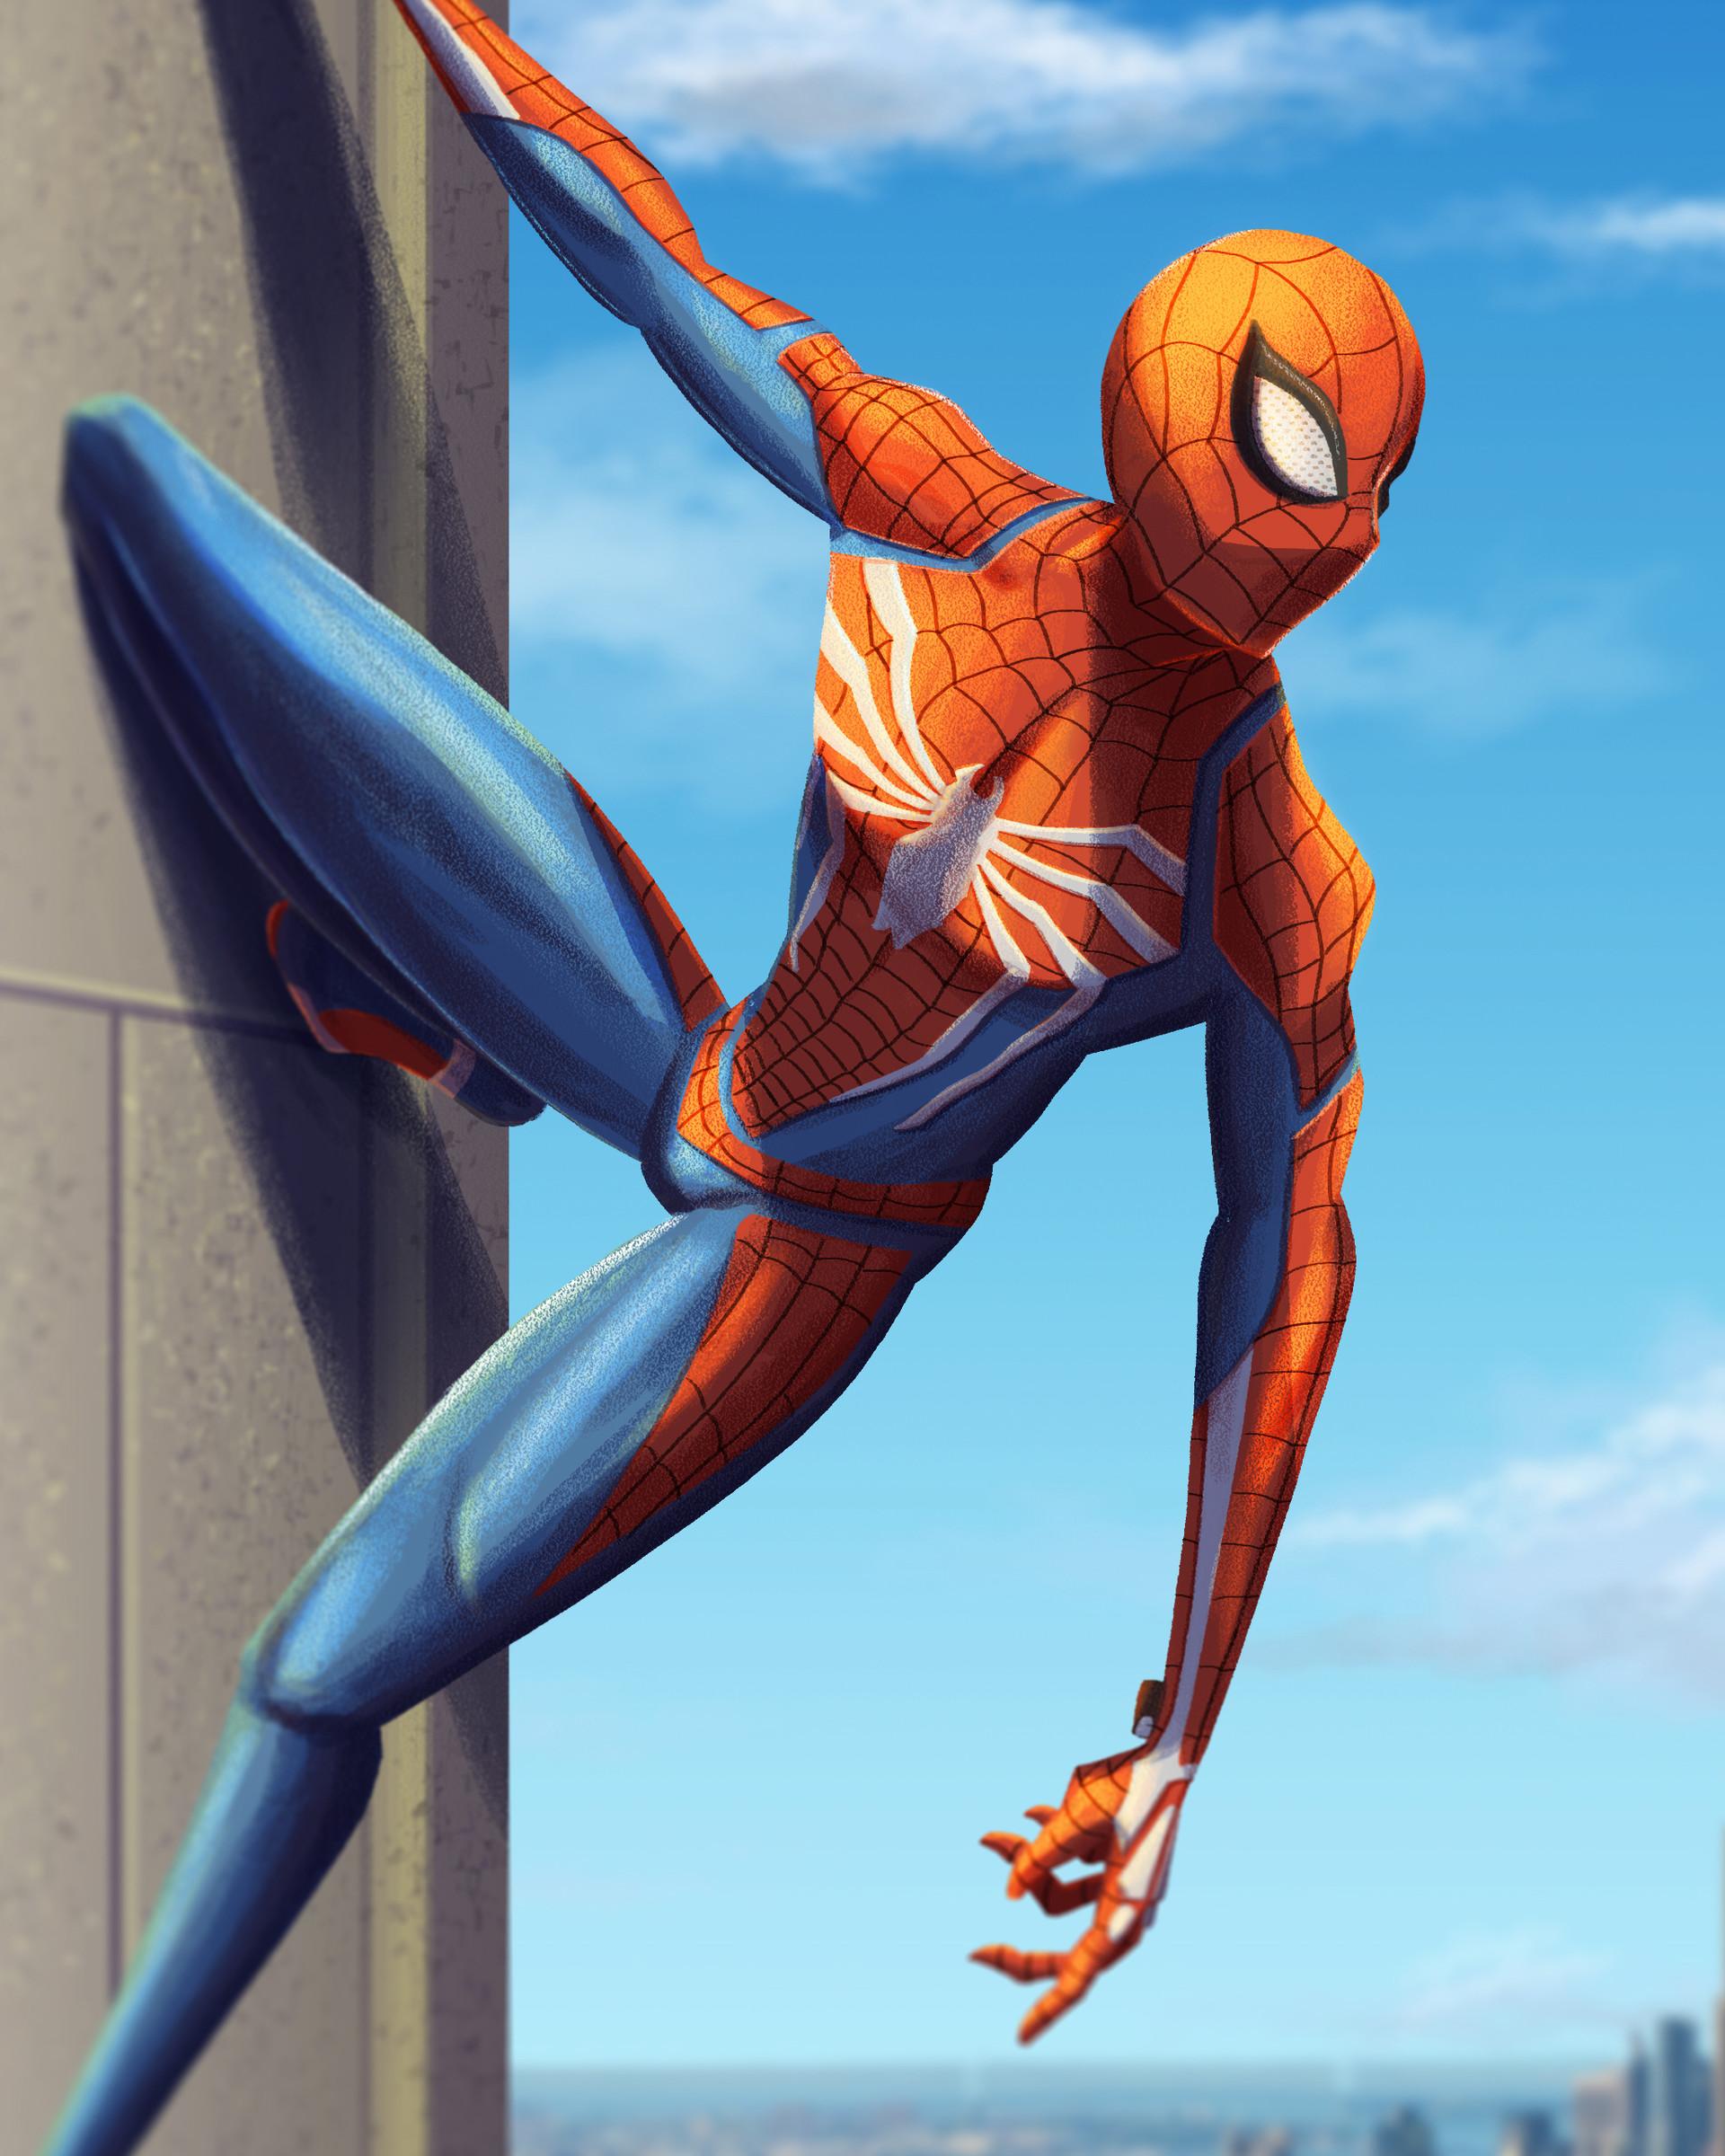 Rafael andrade spiderman2